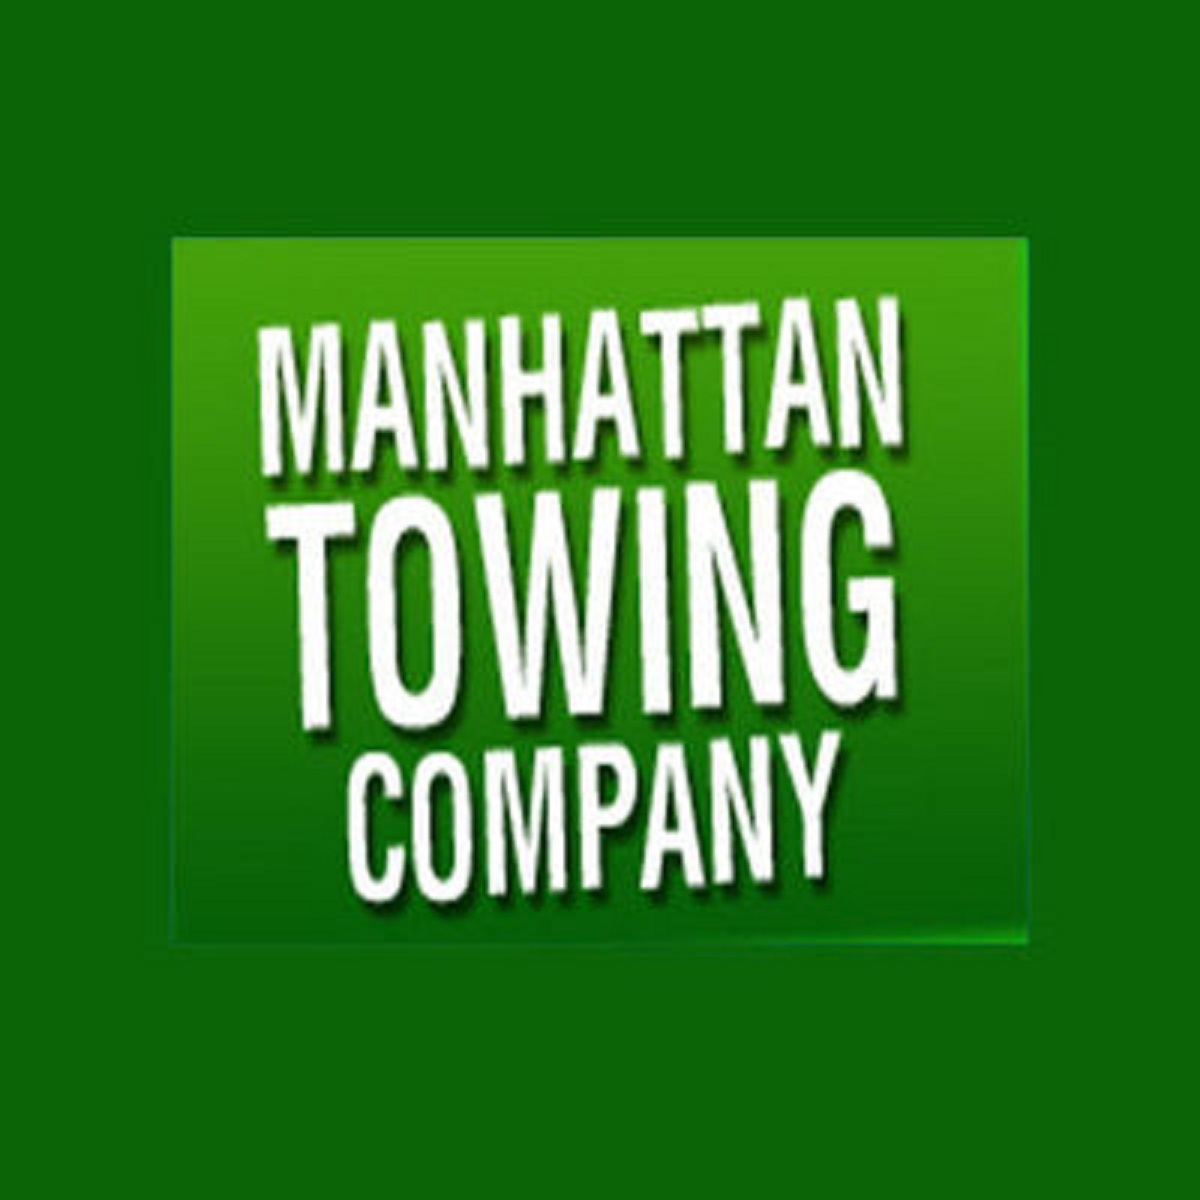 Manhattan Towing Company